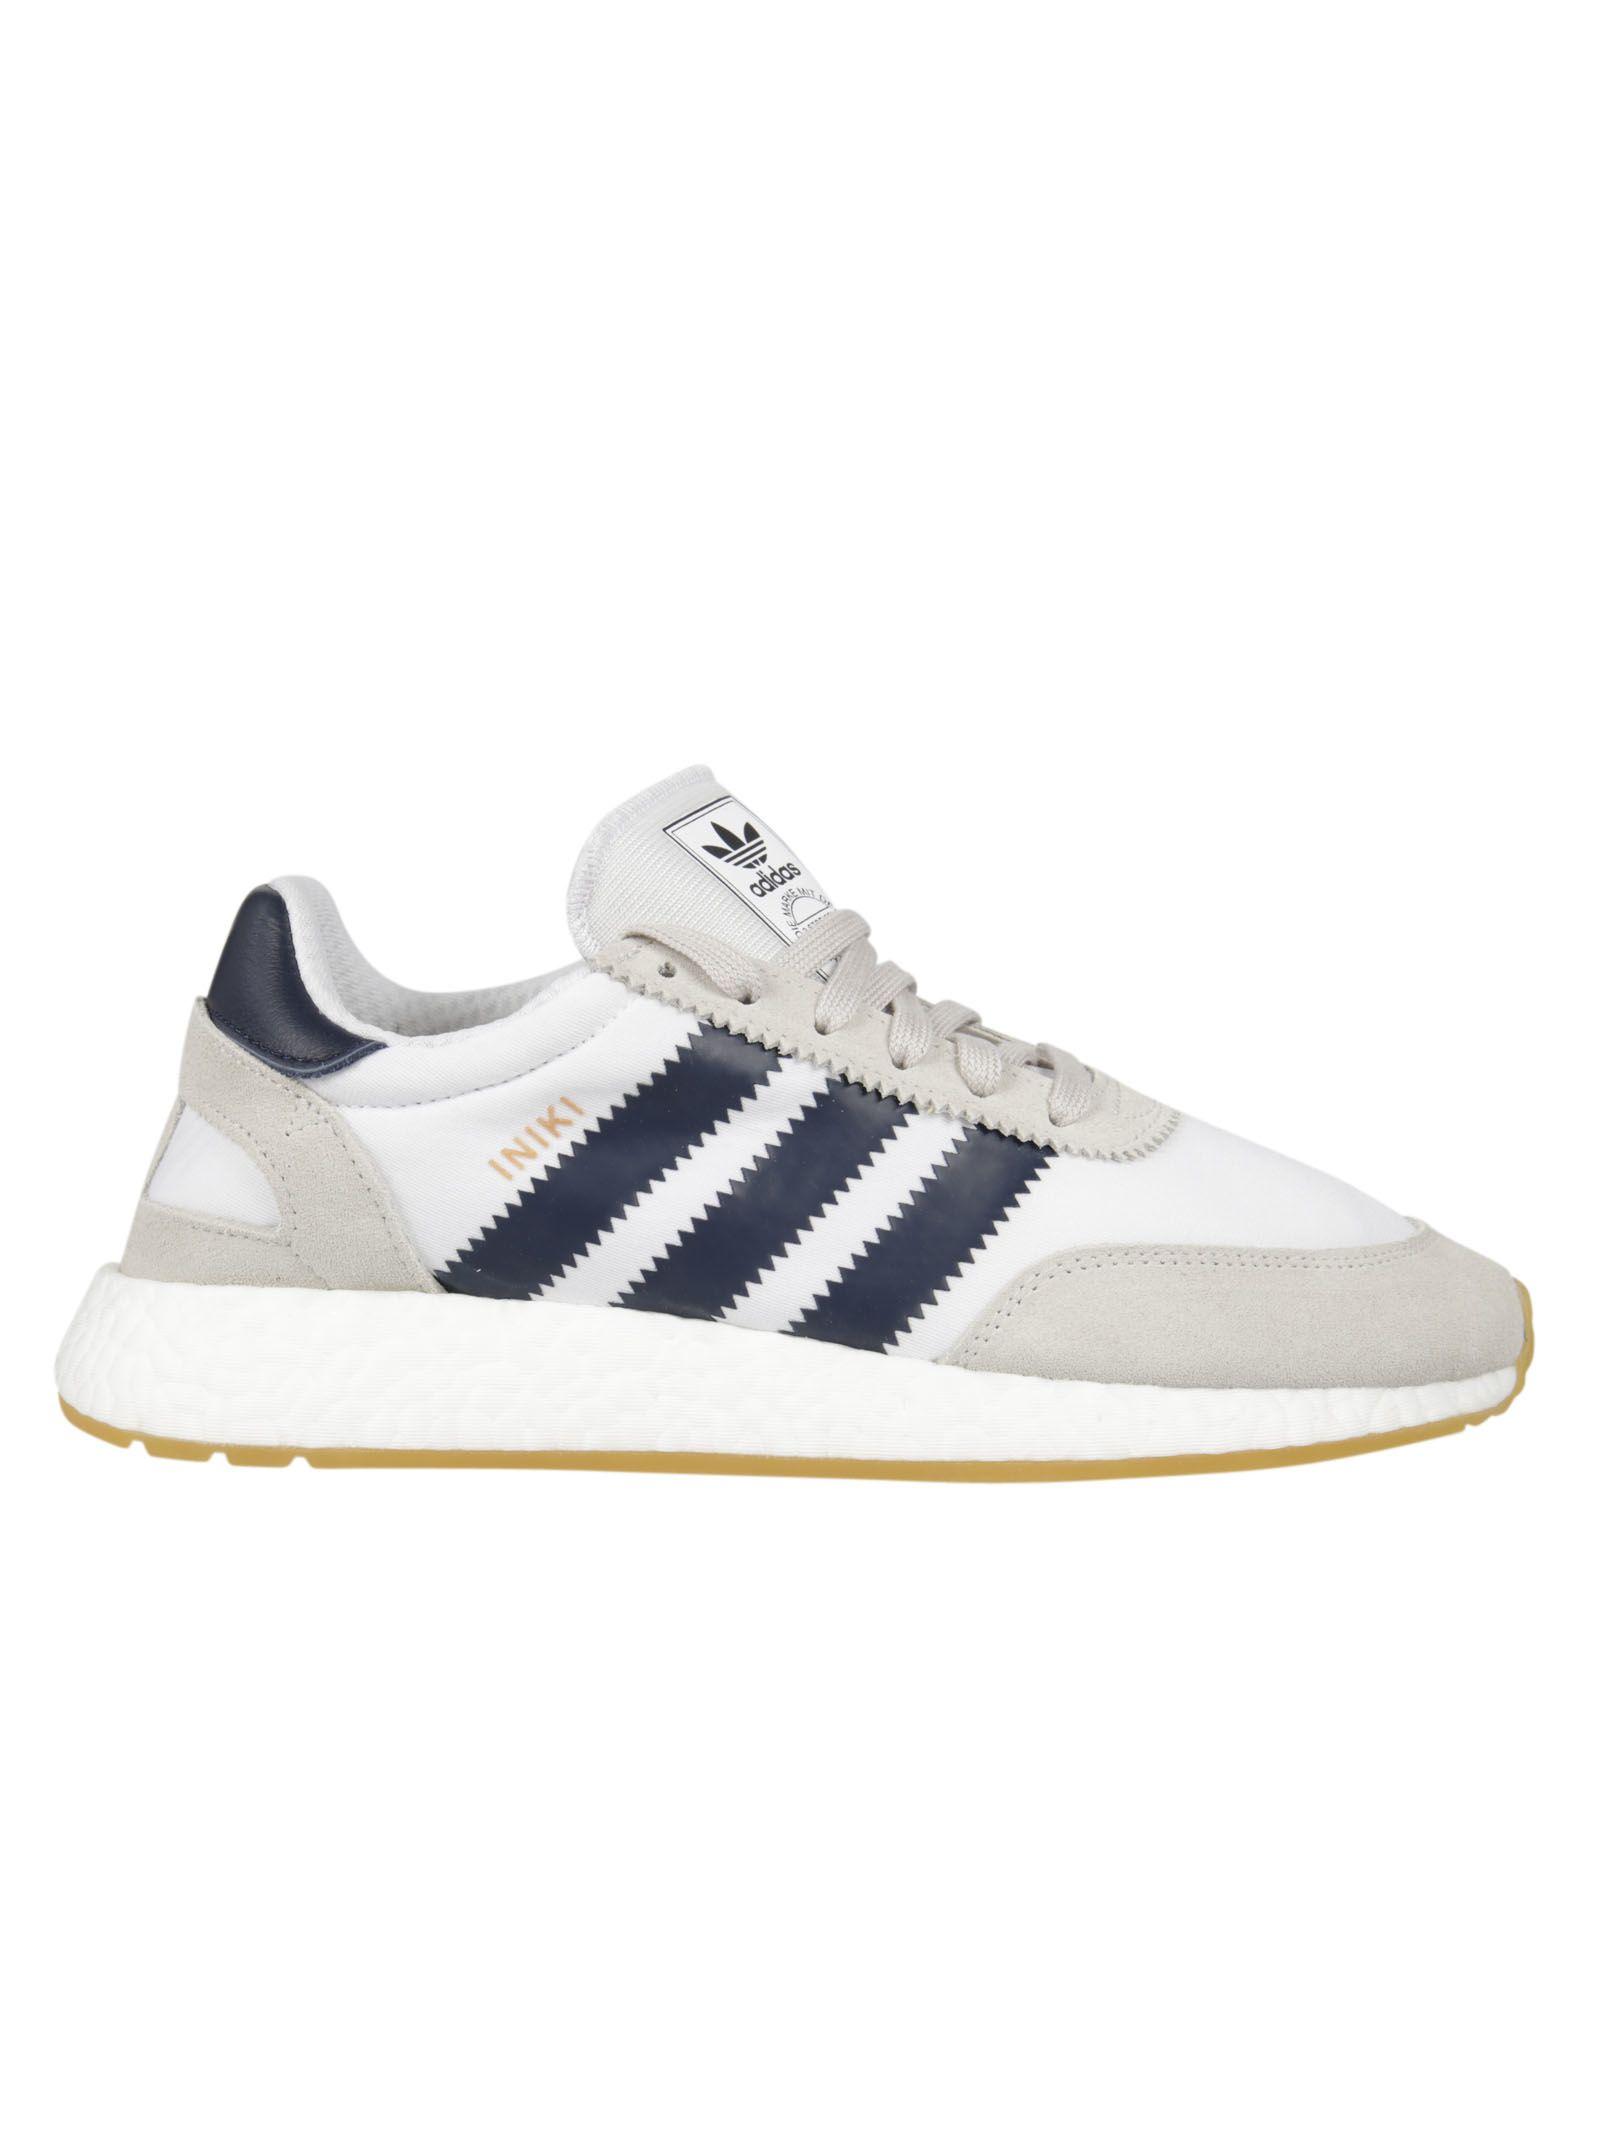 Adidas Originals Iniki Zigzag Stripes Sneakers